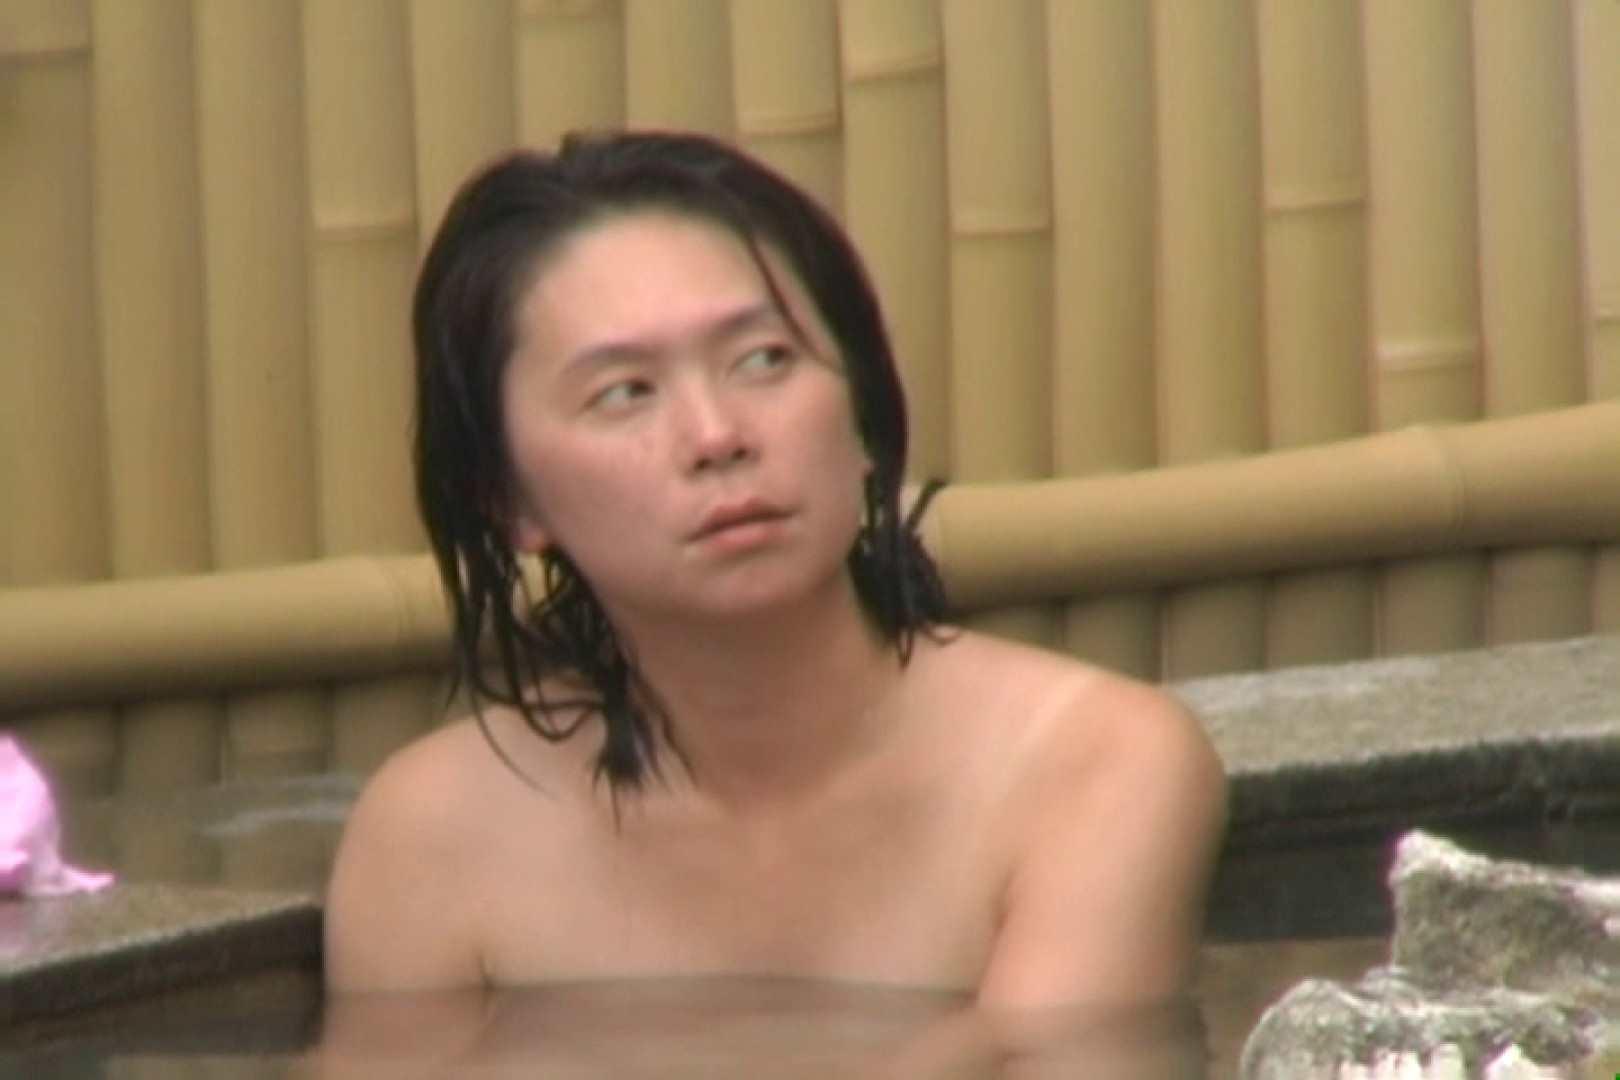 Aquaな露天風呂Vol.619 HなOL オマンコ動画キャプチャ 107pic 77